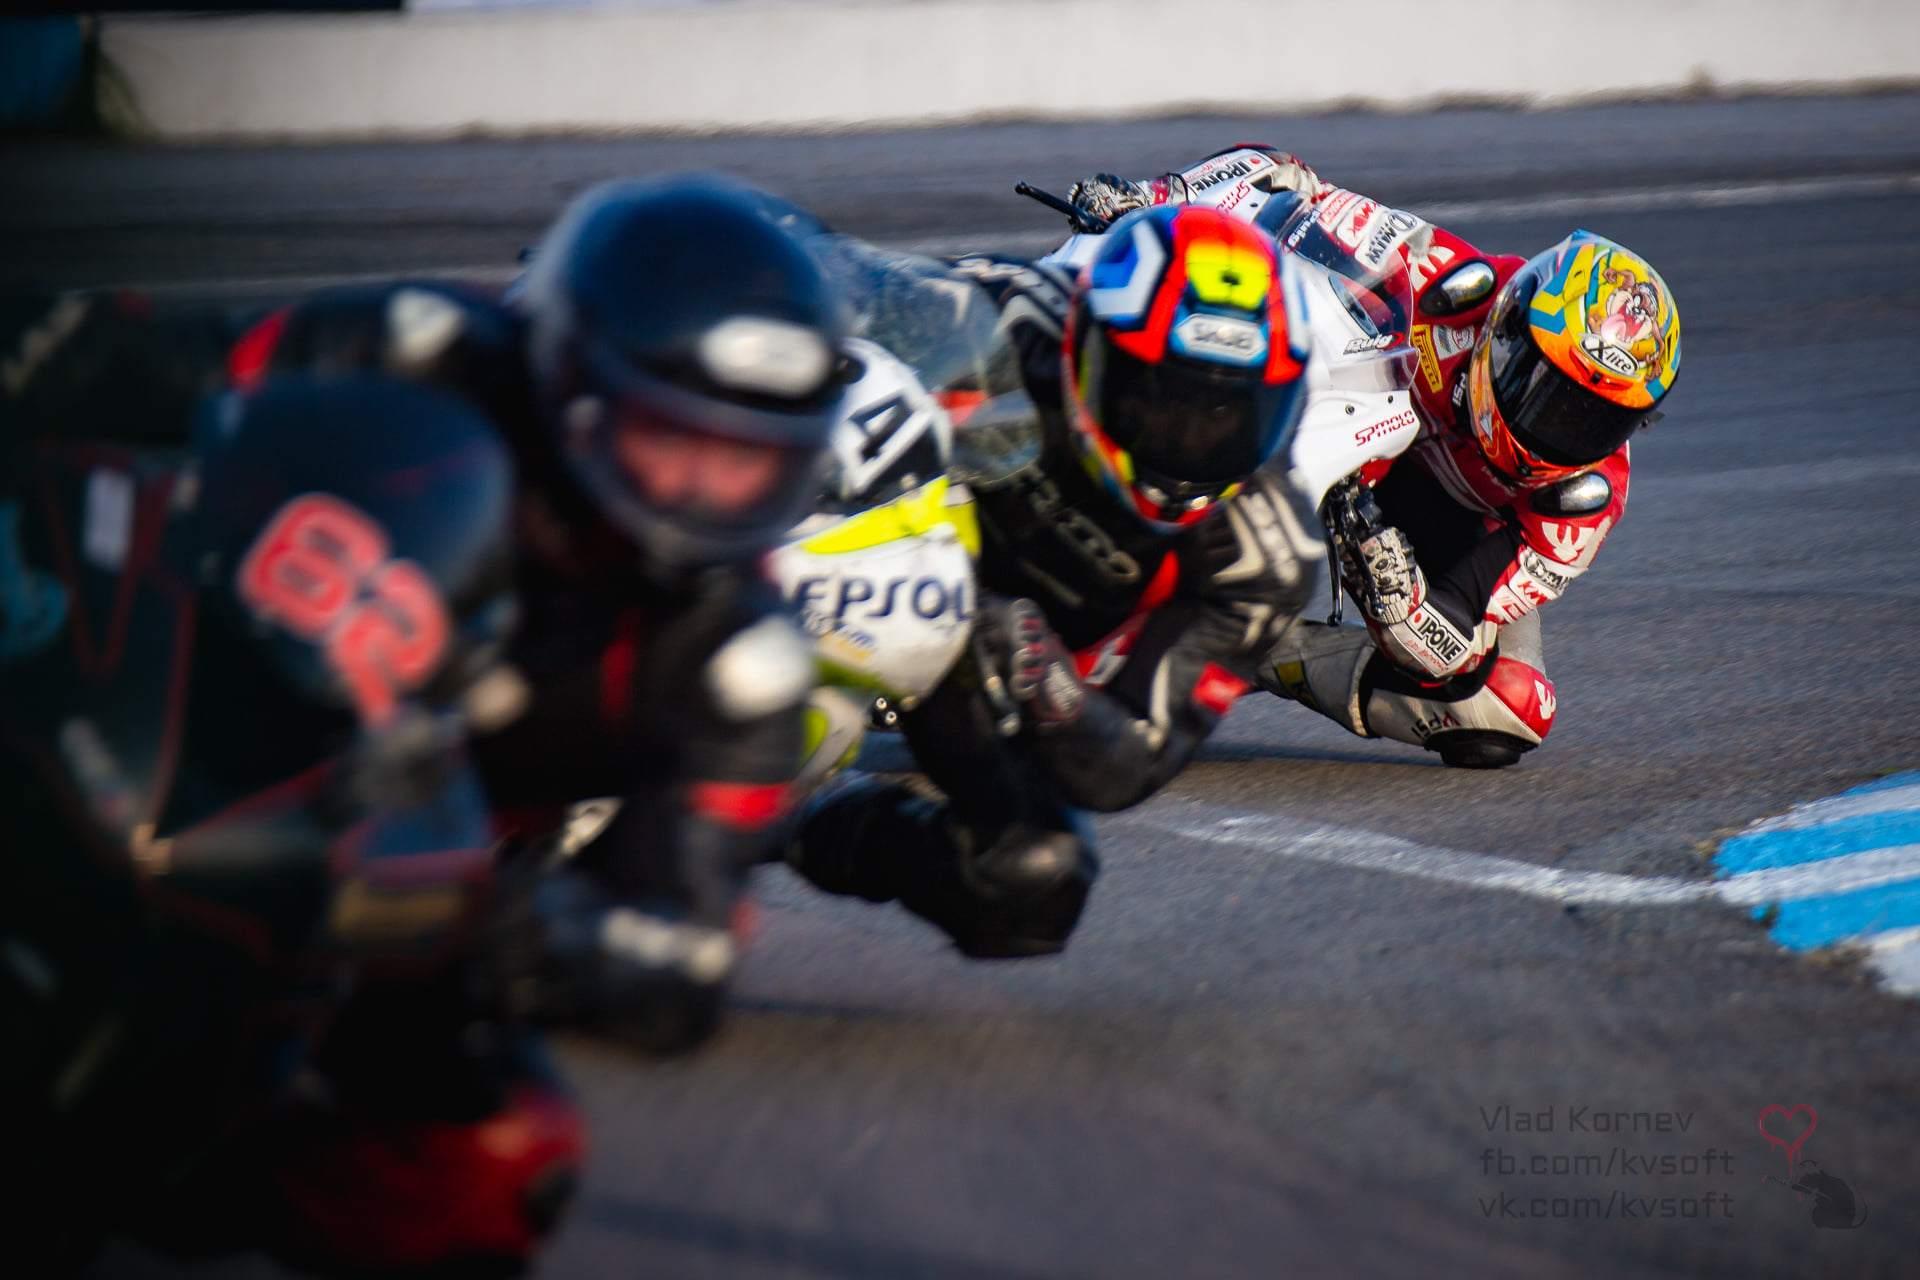 5-6_etap_MotoGPUkraine_011